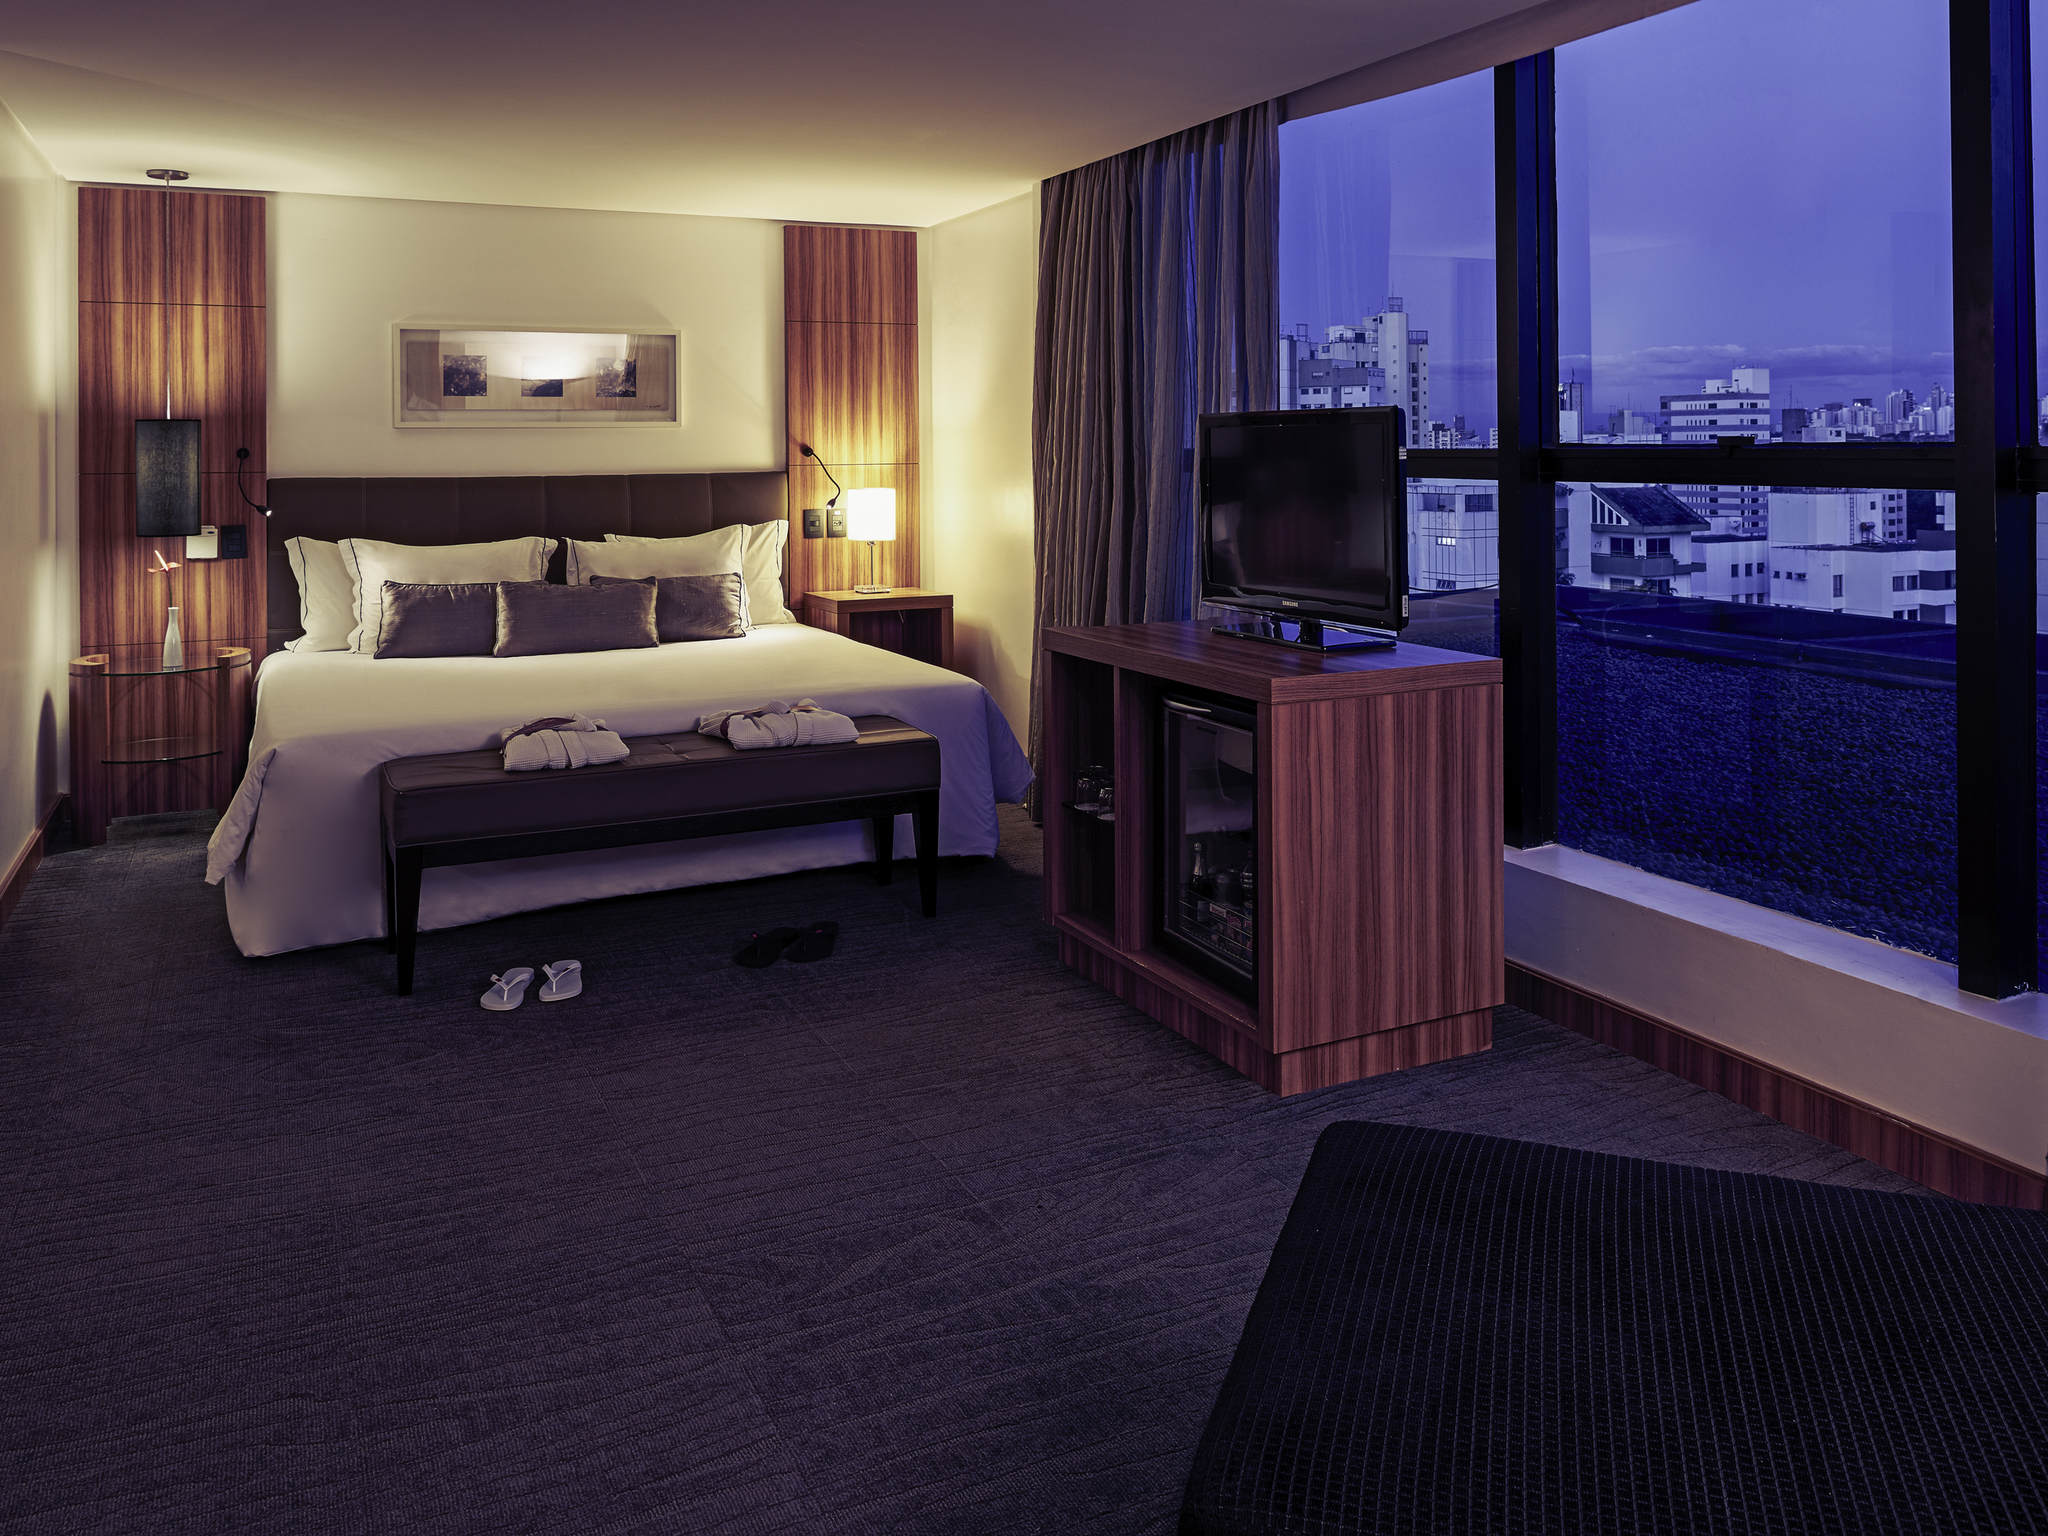 Hotell – Mercure Goiania Hotel